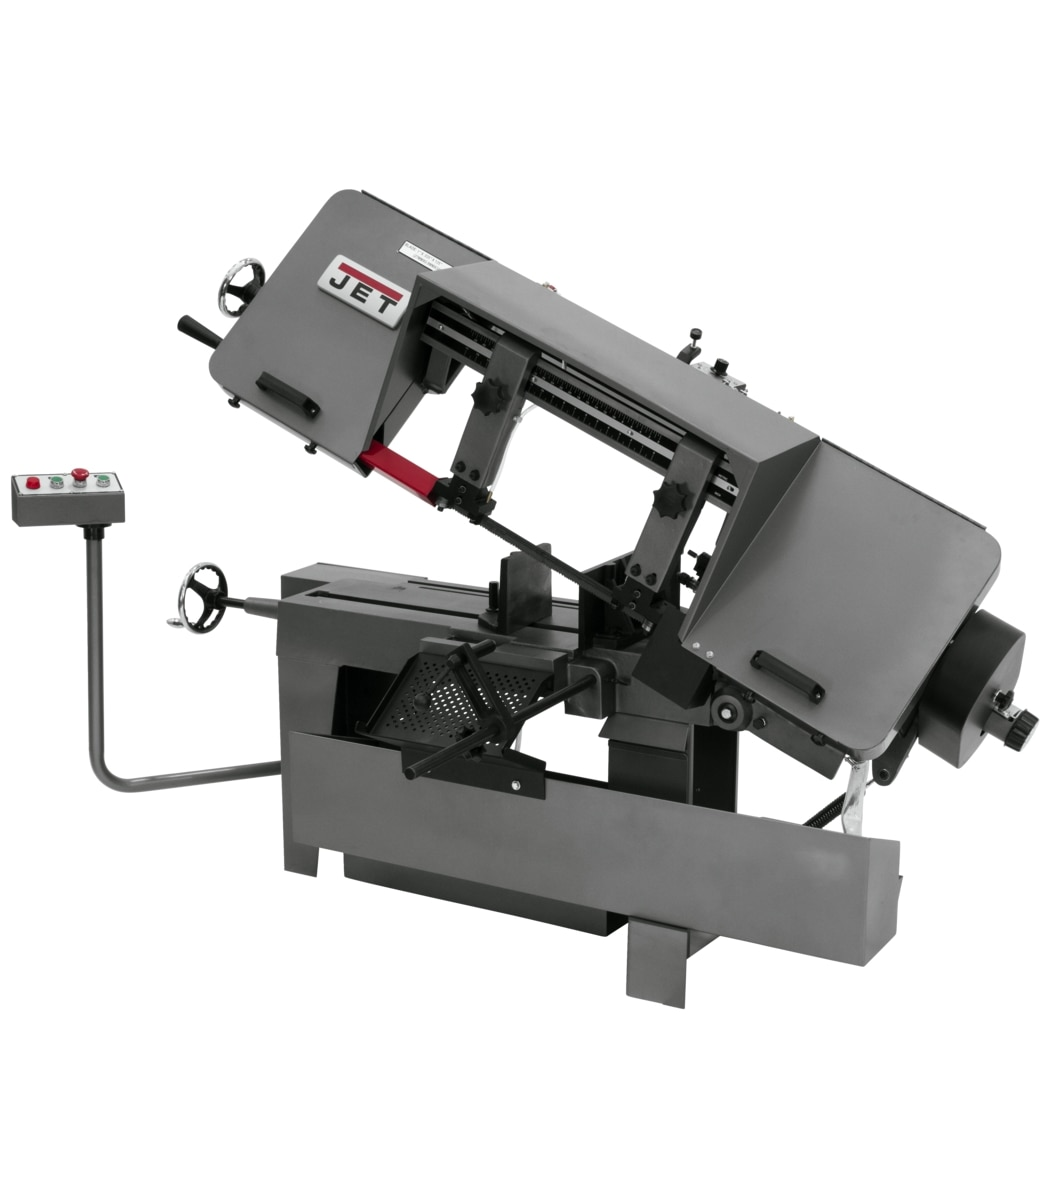 "J-7040-4, 10"" x 16"" Horizontal Bandsaw"